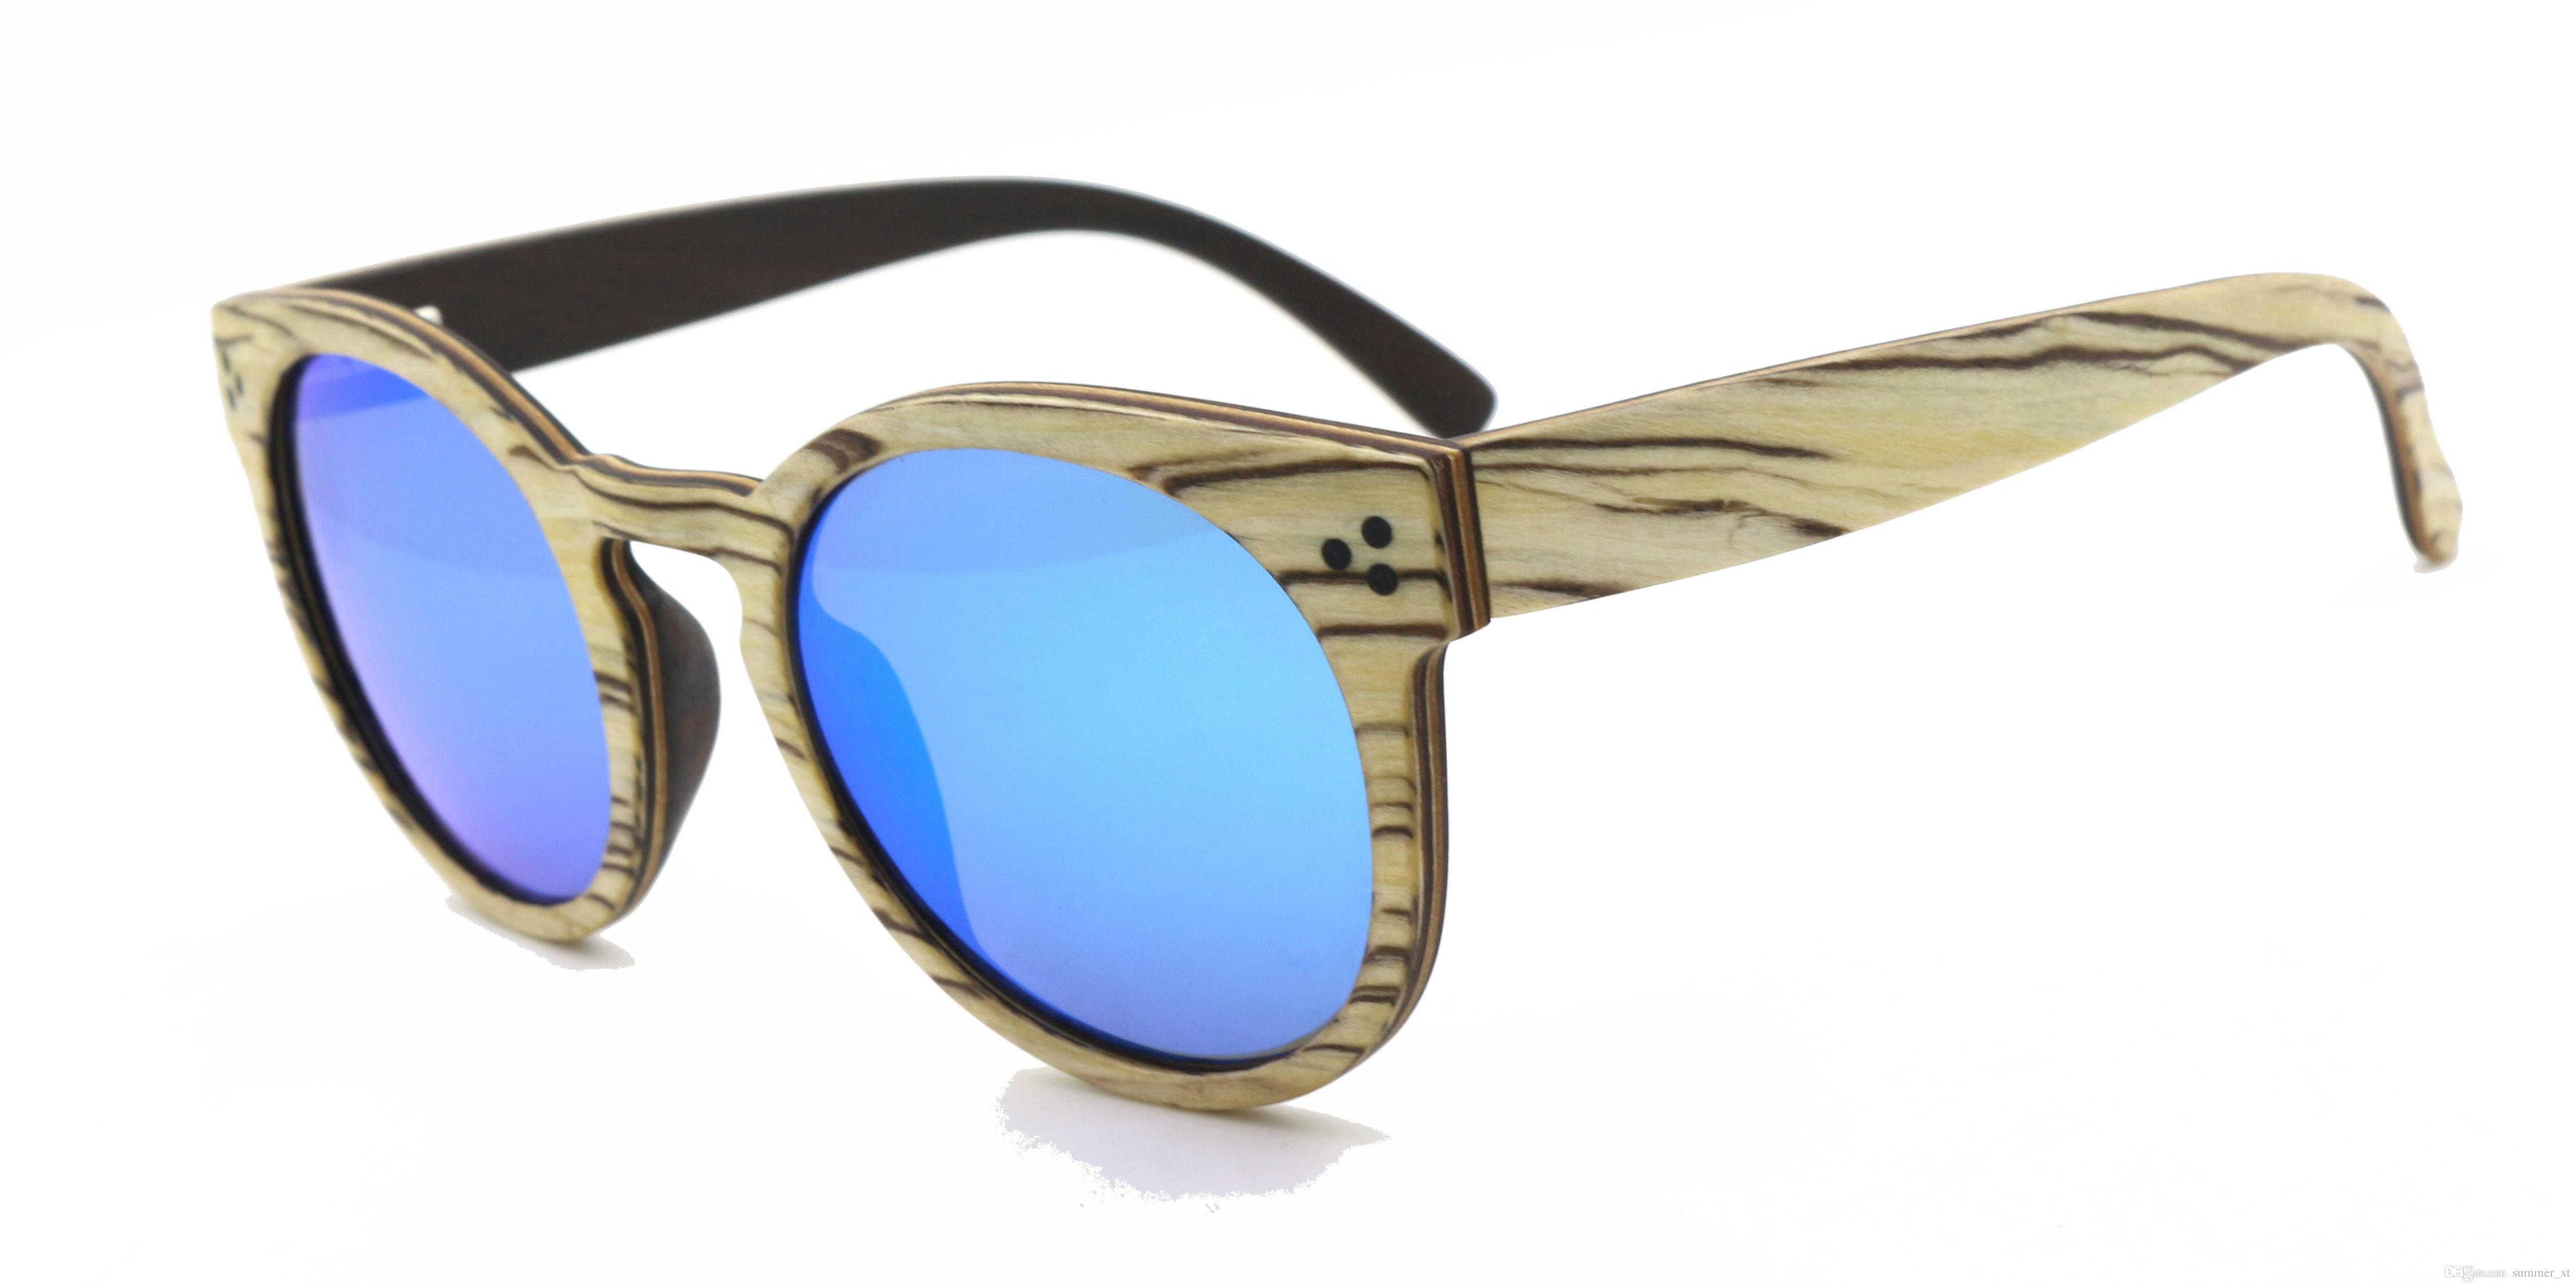 316c9a3c2d Compre Gafas De Sol De Madera Hechas A Mano Naturales Hechas De ...